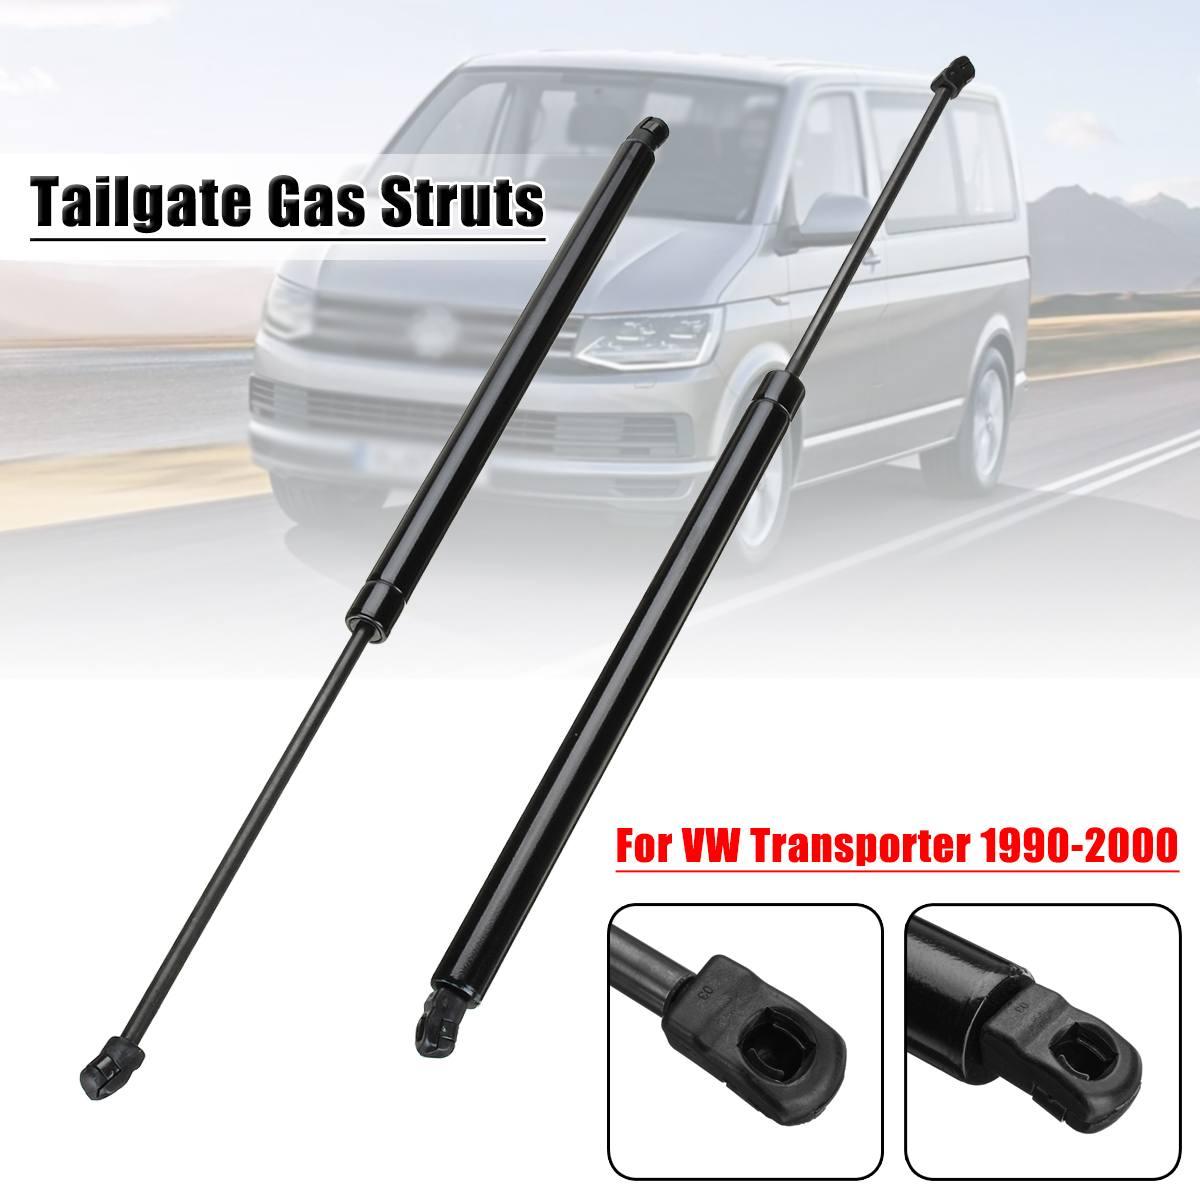 Pair Car Rear Tailgate Lift Trunk Support Rod Gas Struts 970N for Volkswagen for VW Transporter T4 Transporter MK IV 1990 2003